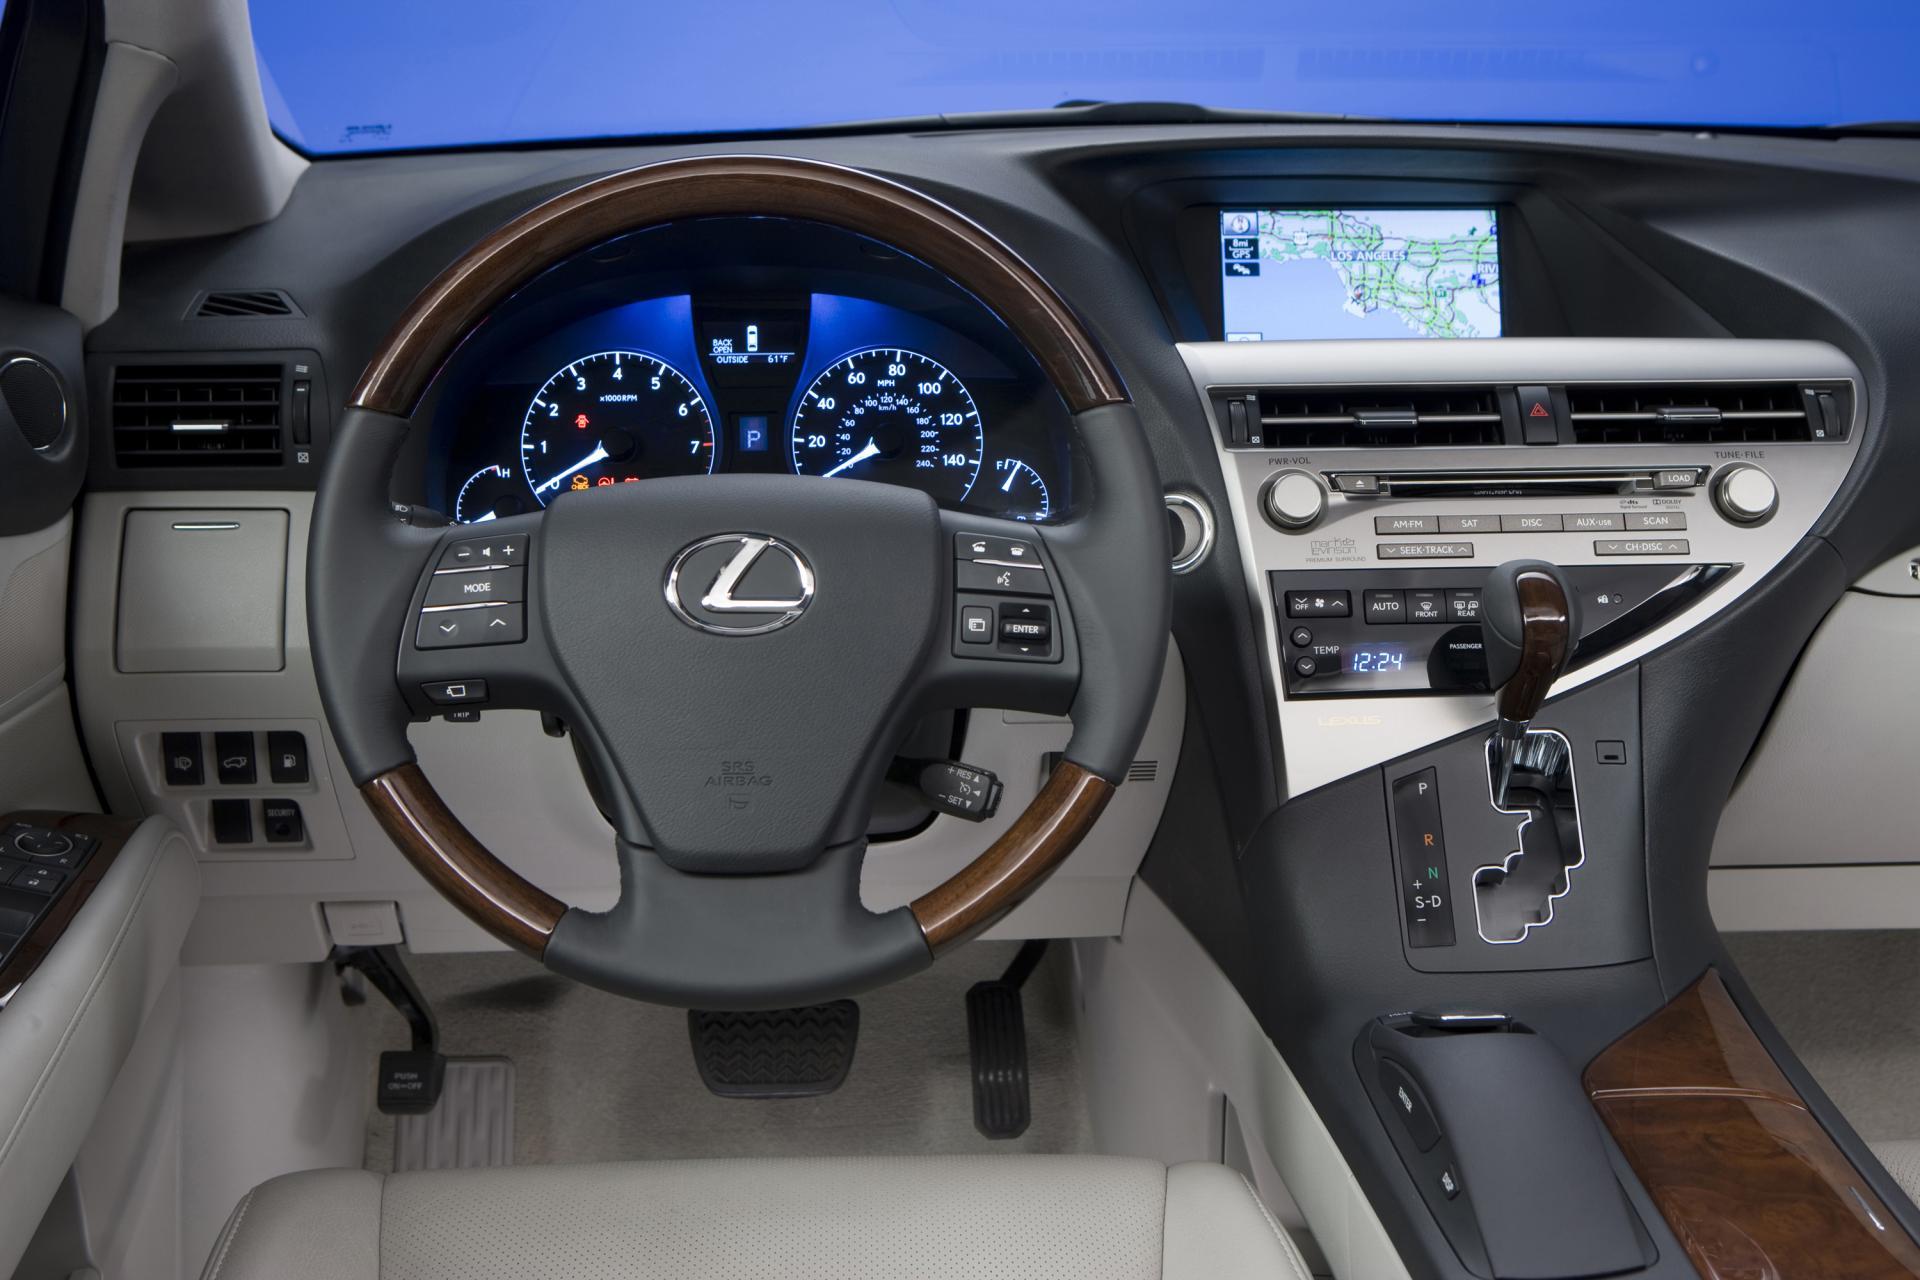 v interior trim color suv exterior buy model body owned pre type black nj lexus leather hybrid engine make car used for sale